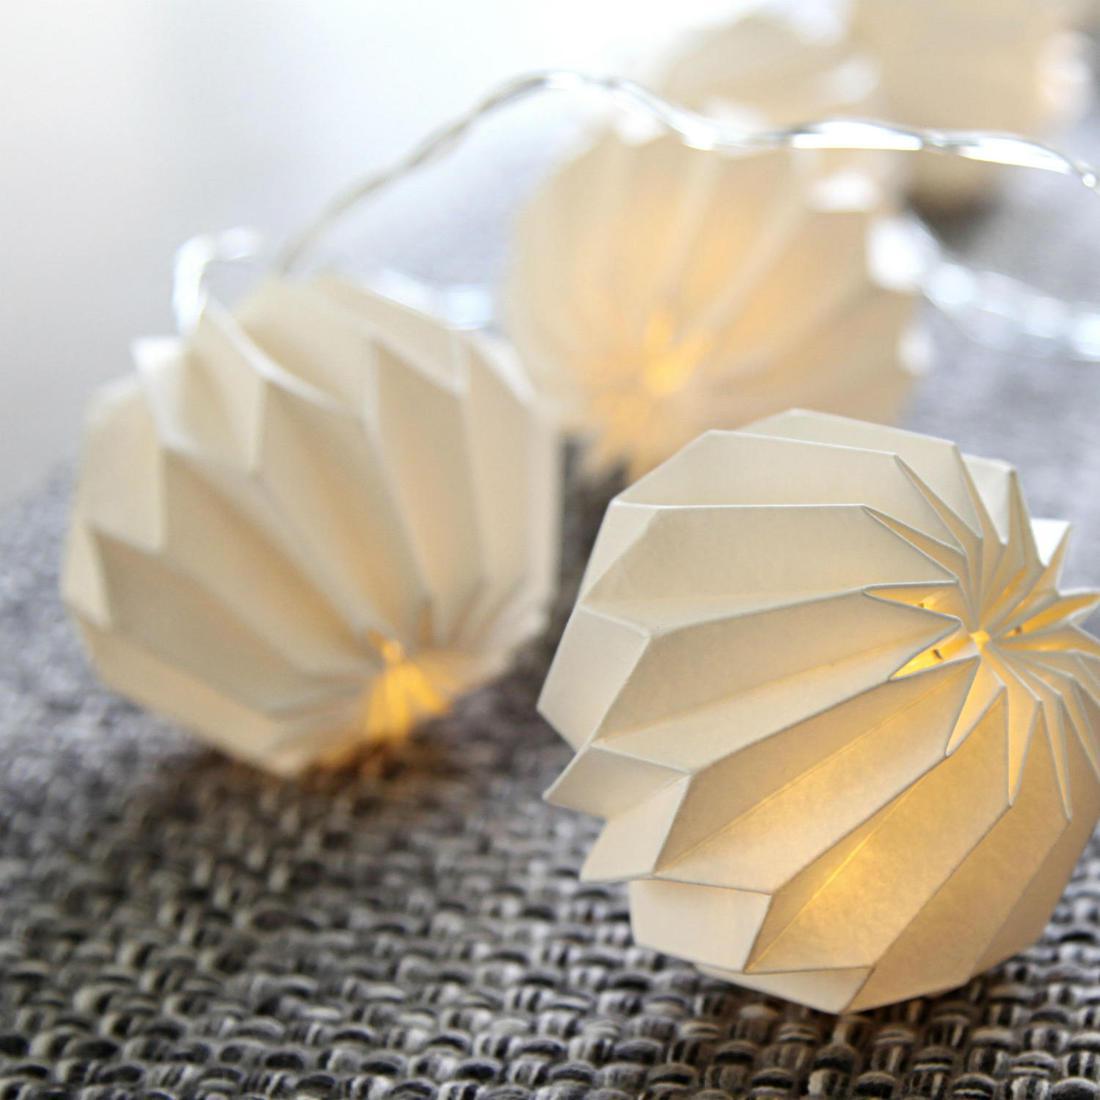 http://www.turbulences-deco.fr/wp-content/uploads/2015/12/guirlande-lumineuse-origami-blanc-led-paper-flower.jpg